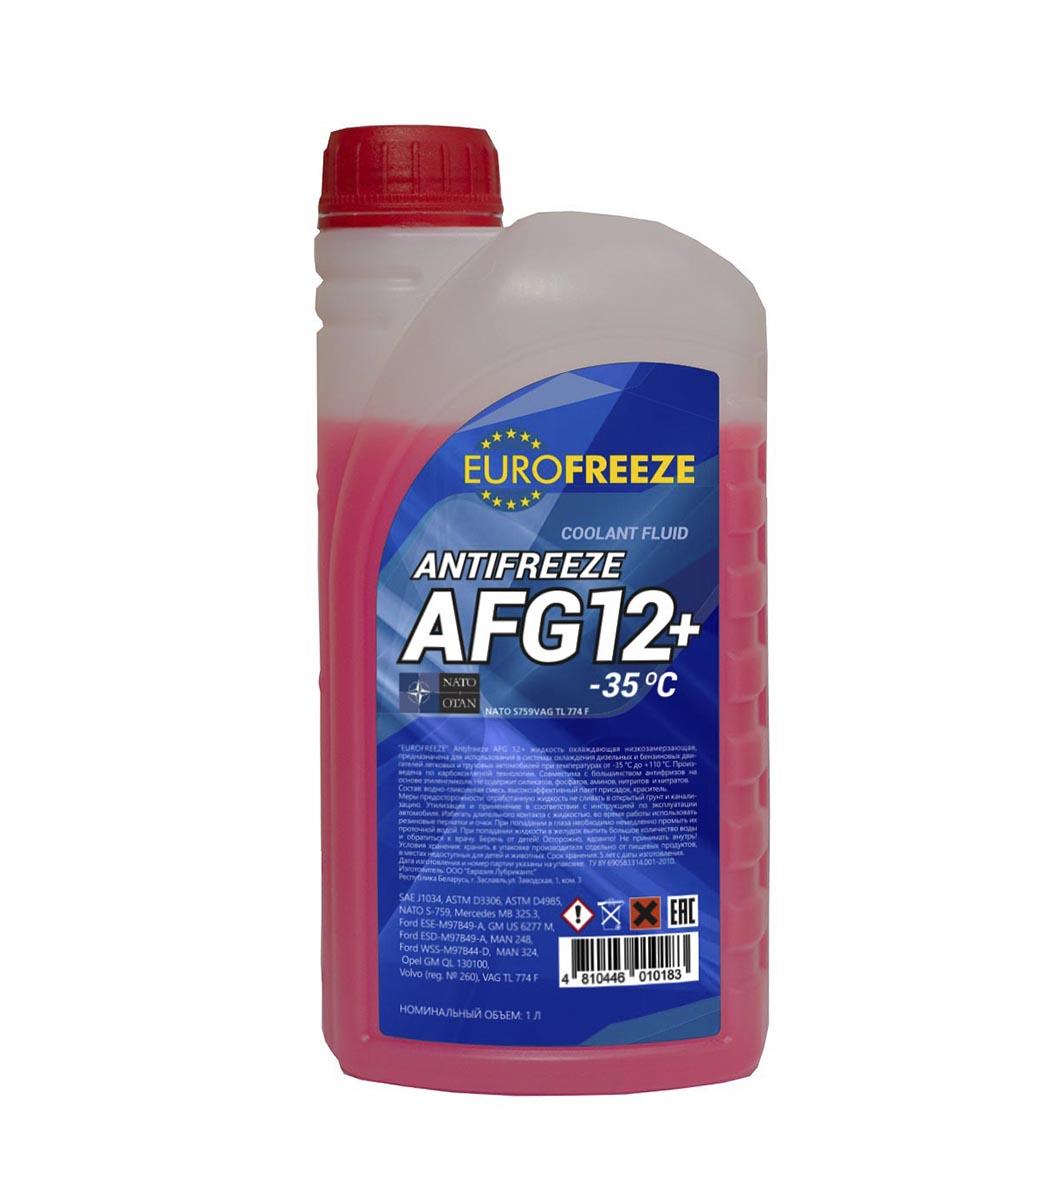 Eurofreeze Antifreeze AFG 12+